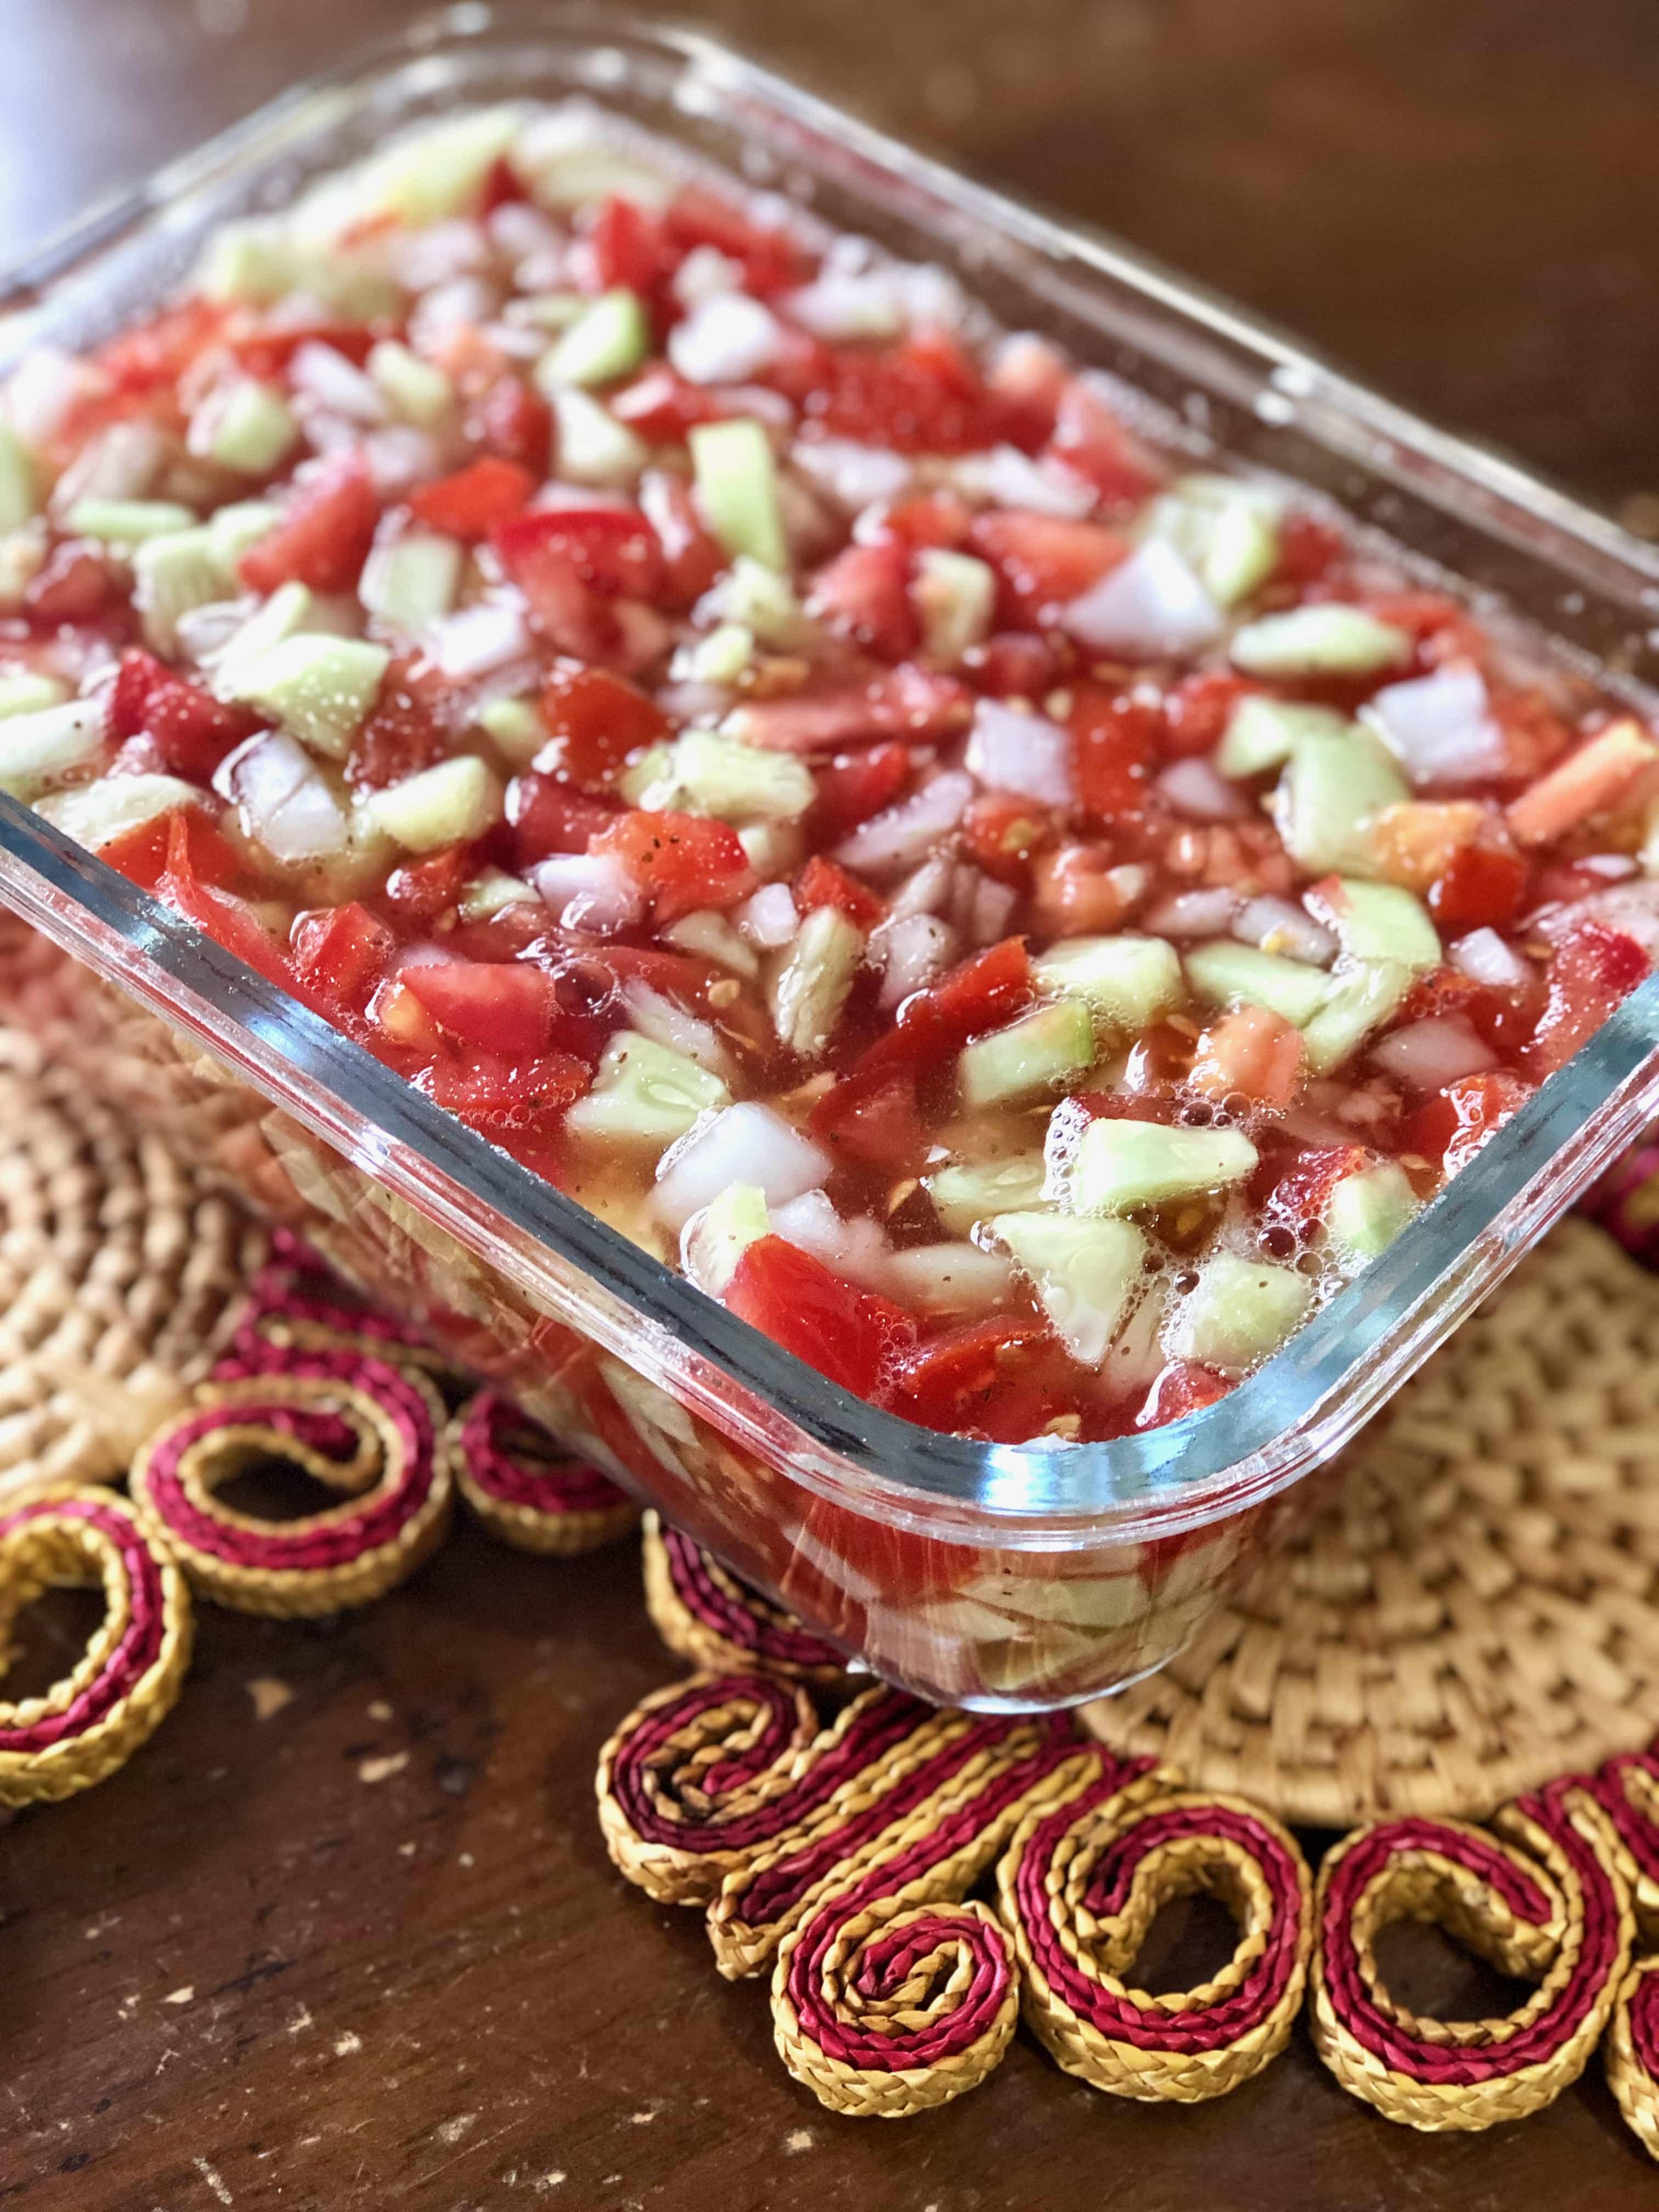 tomatoes, cucumbers and onions make granny mac's goulash